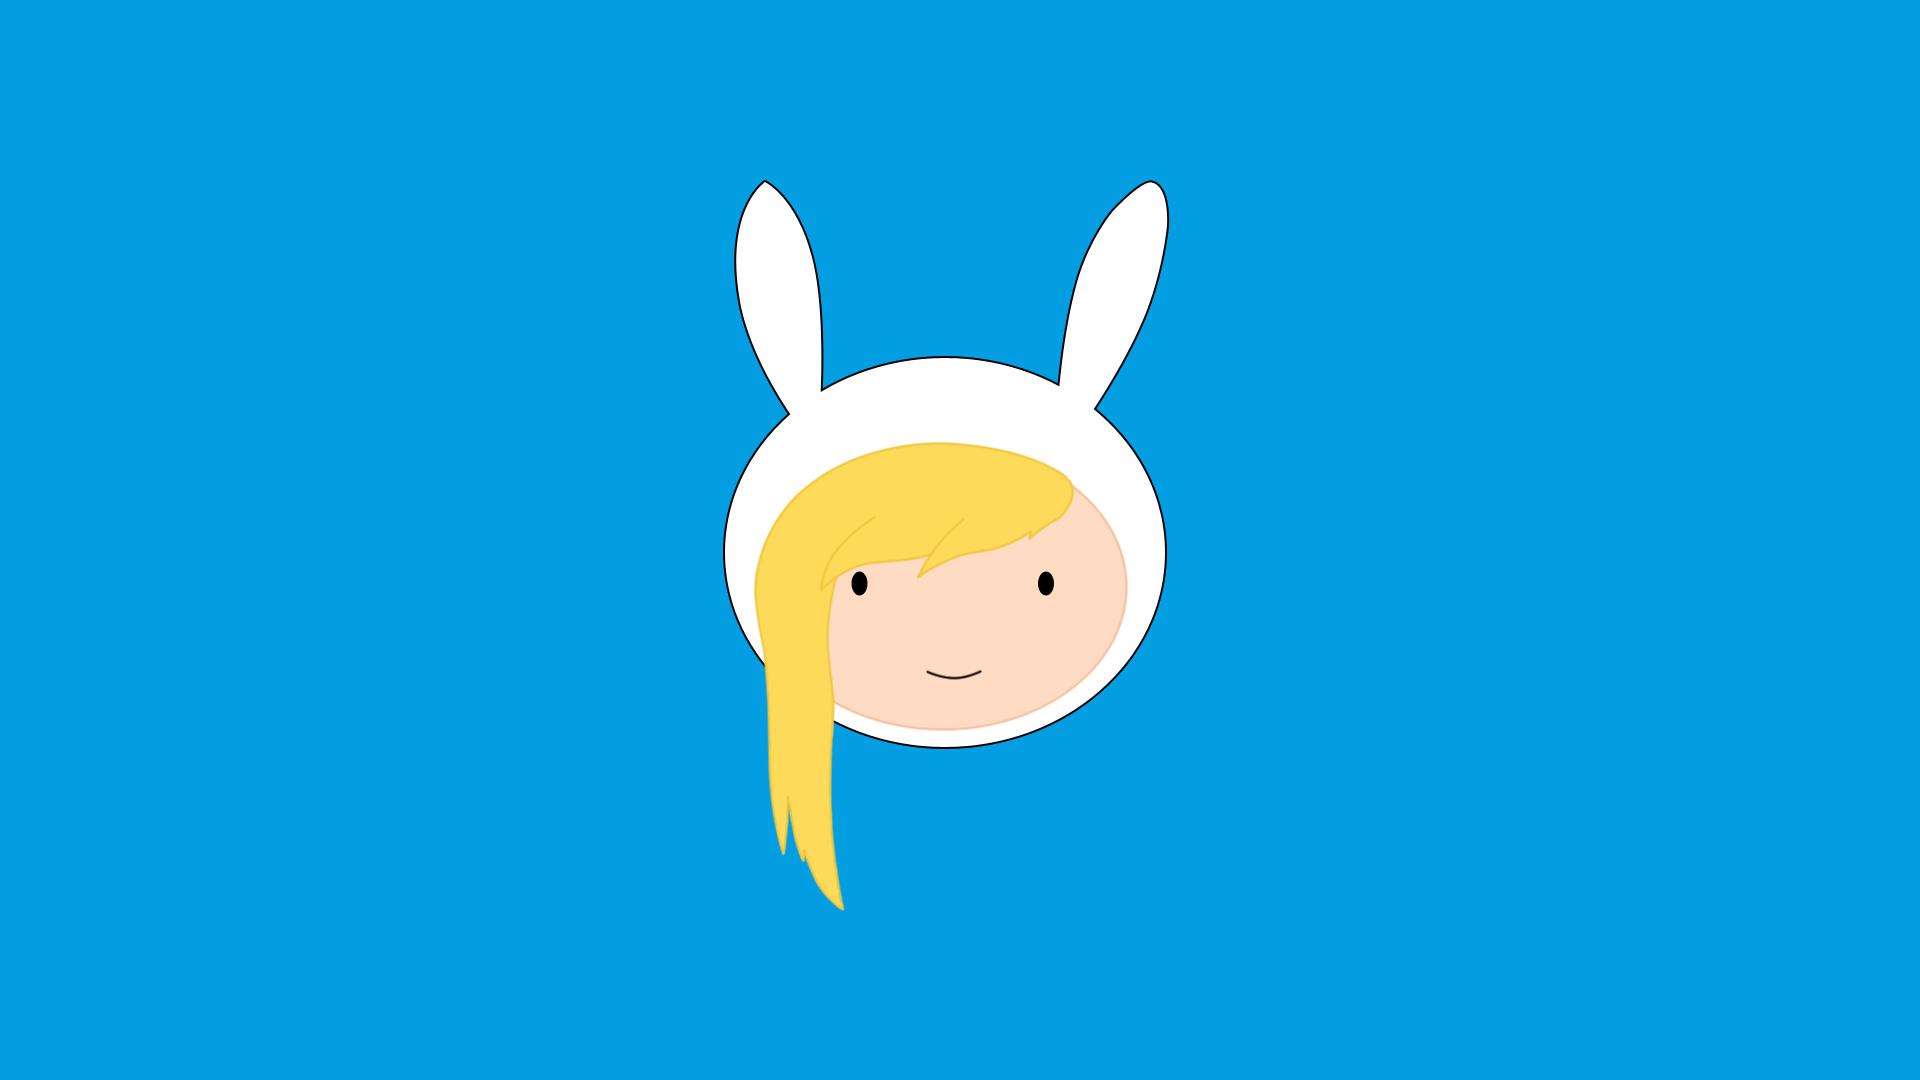 Wallpaper iphone adventure time - Report Rss Adventure Time Wallpaper For Computer And Phone View Original